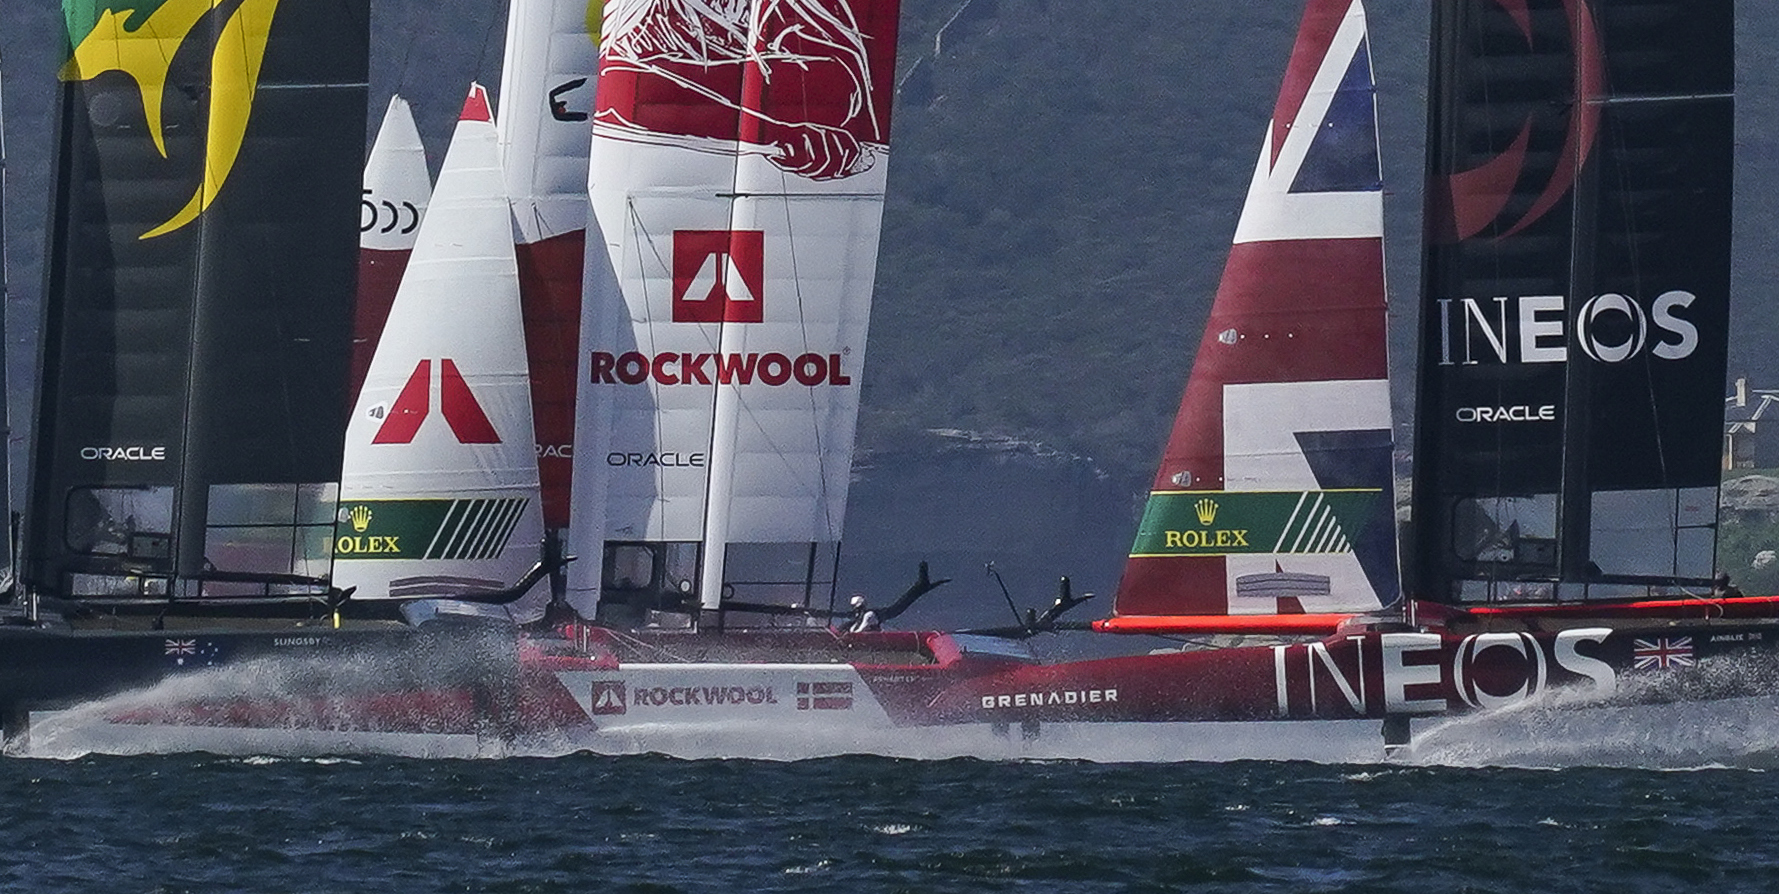 SailGP F50 Boats Racing High Speed